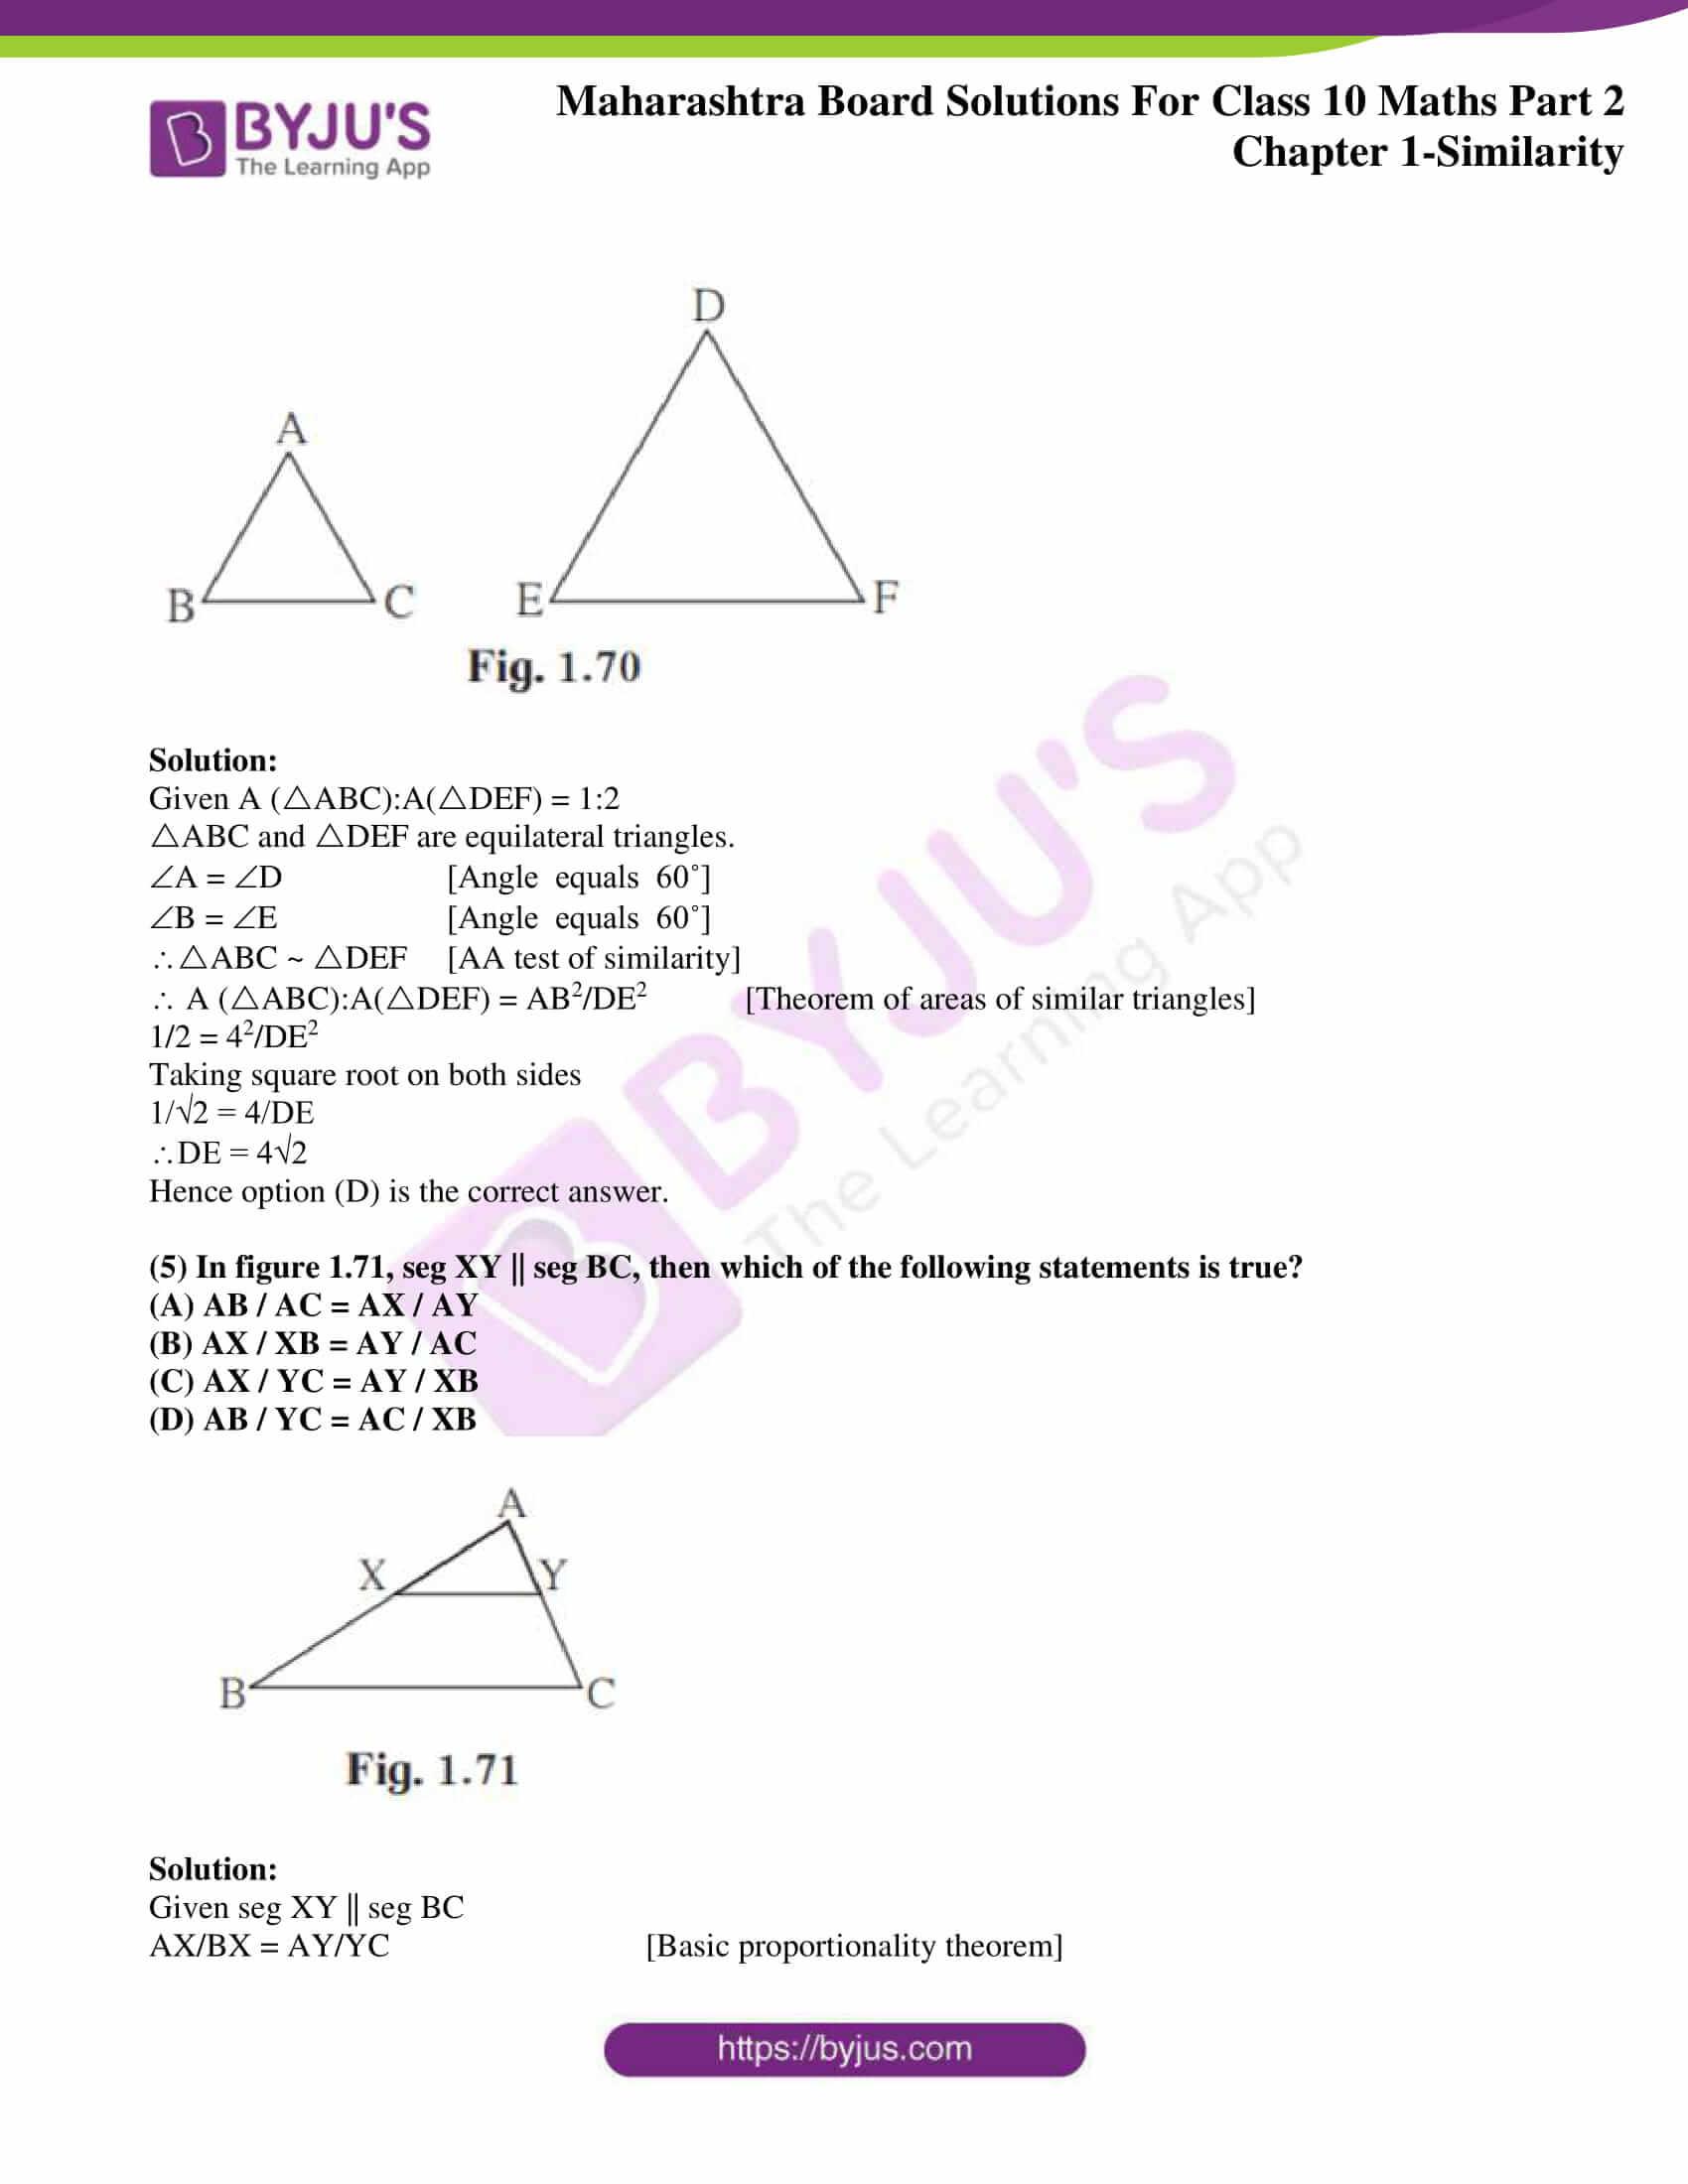 msbshse sol class 10 maths part 2 chapter 1 20